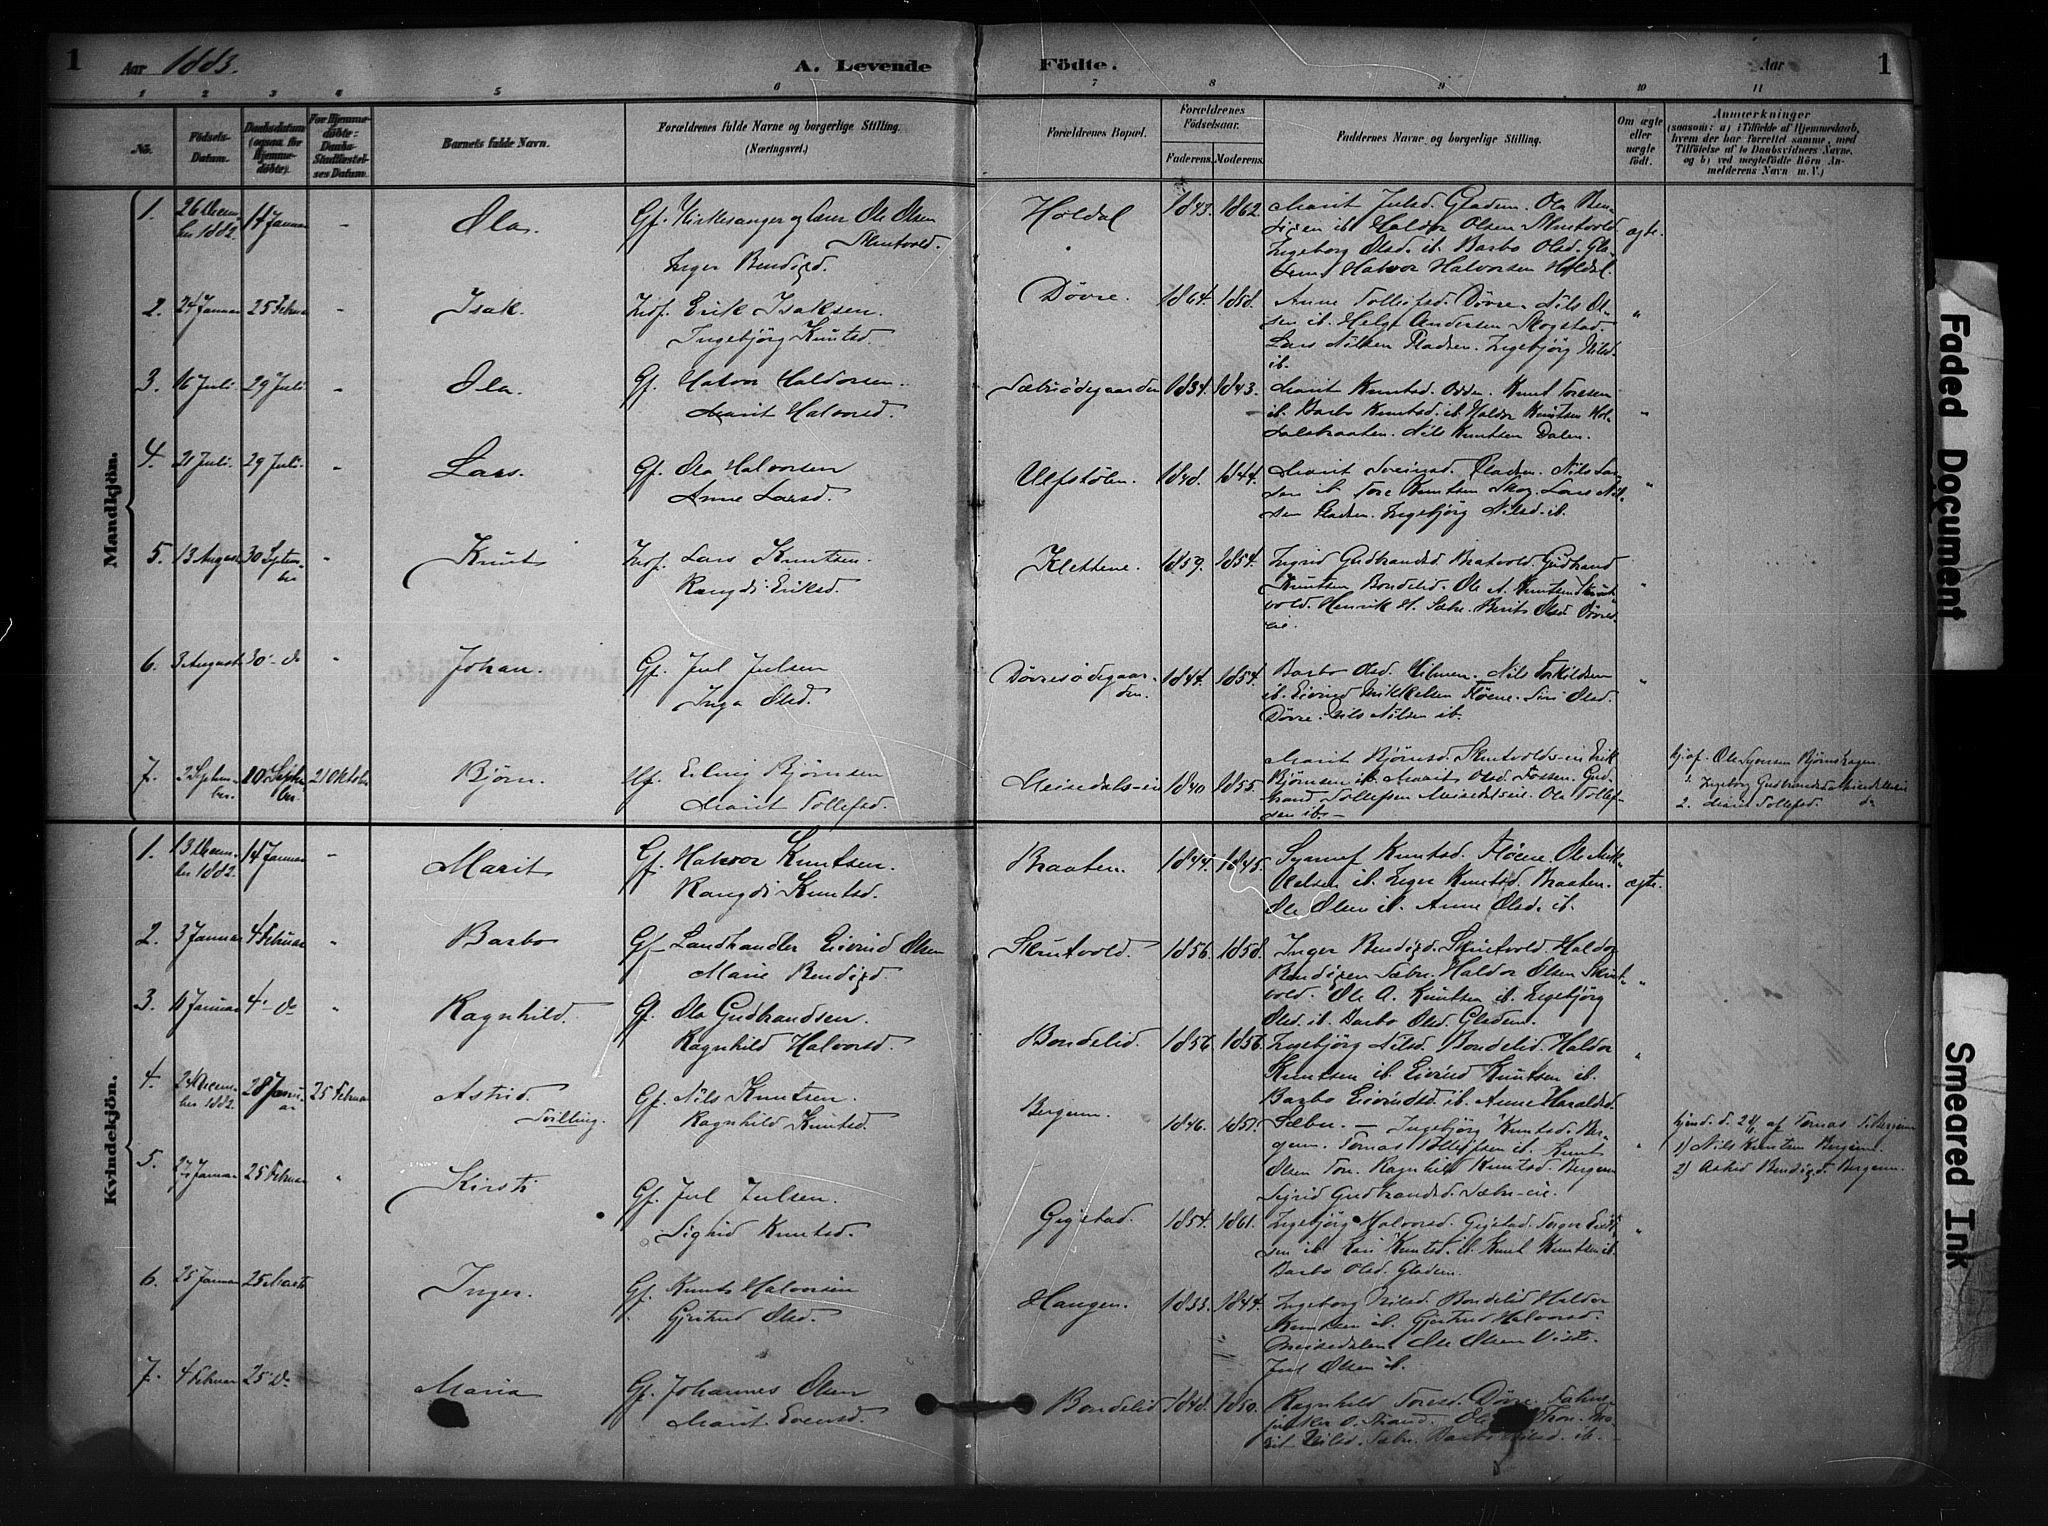 SAH, Nord-Aurdal prestekontor, Ministerialbok nr. 12, 1883-1895, s. 1